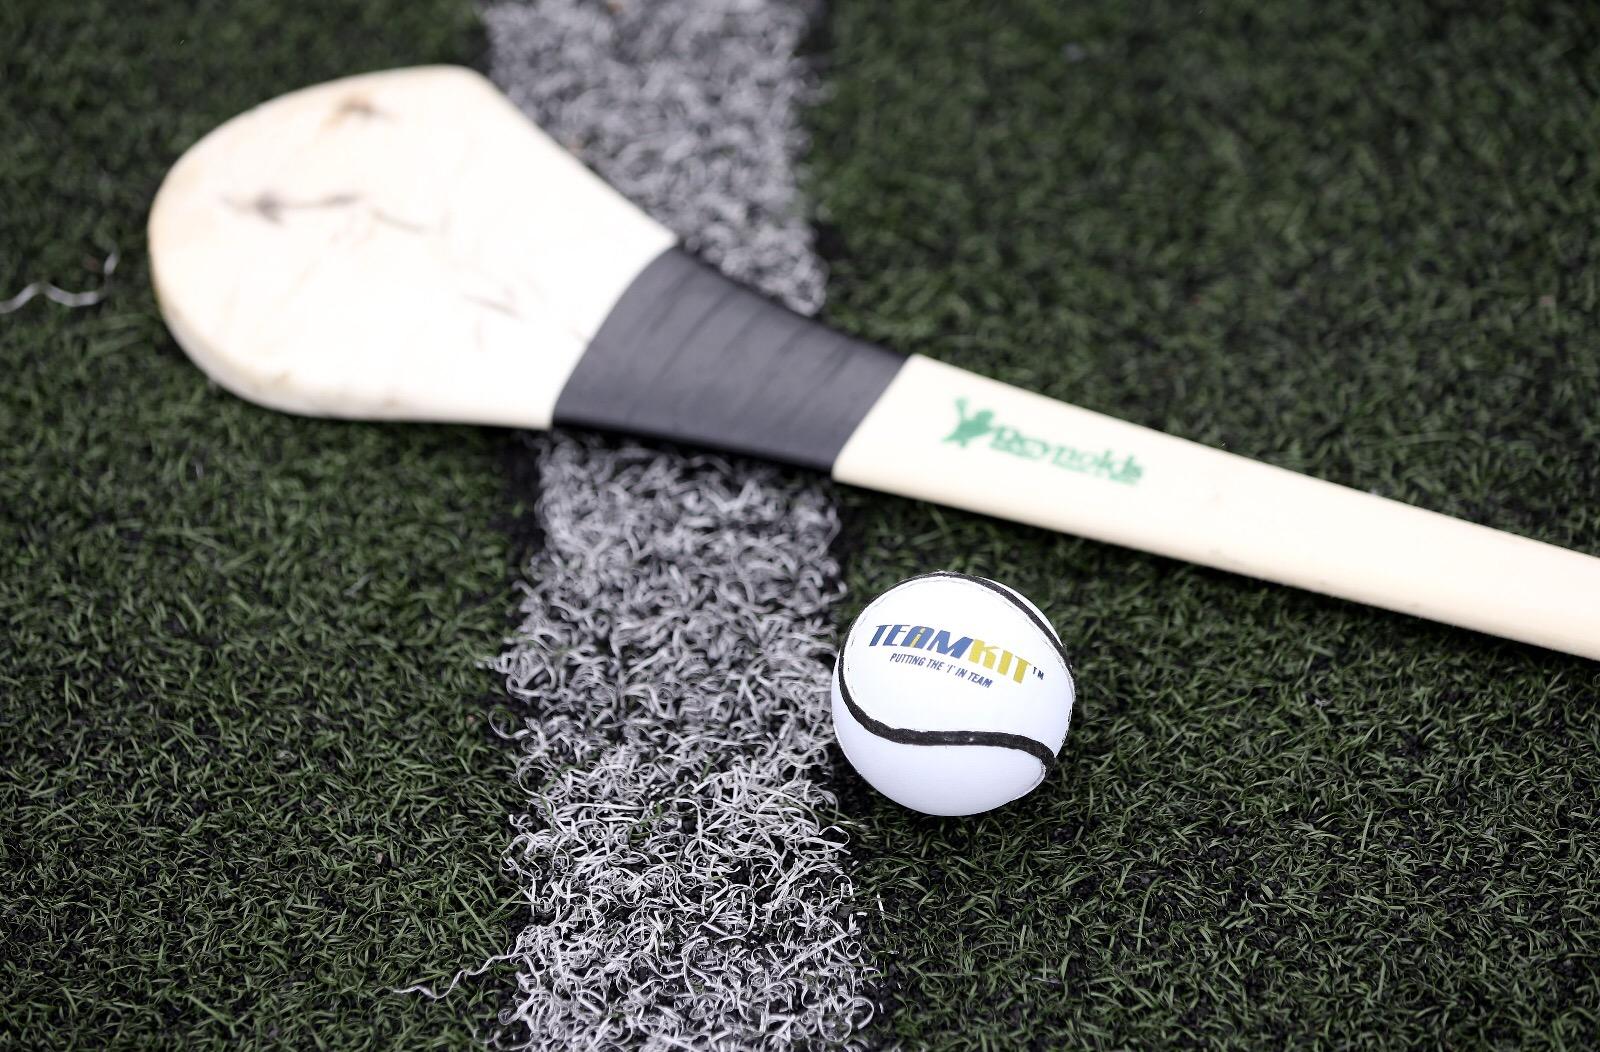 Hurling Sticks For Sale Reynolds Hurleys Composite Synthetic grass 3